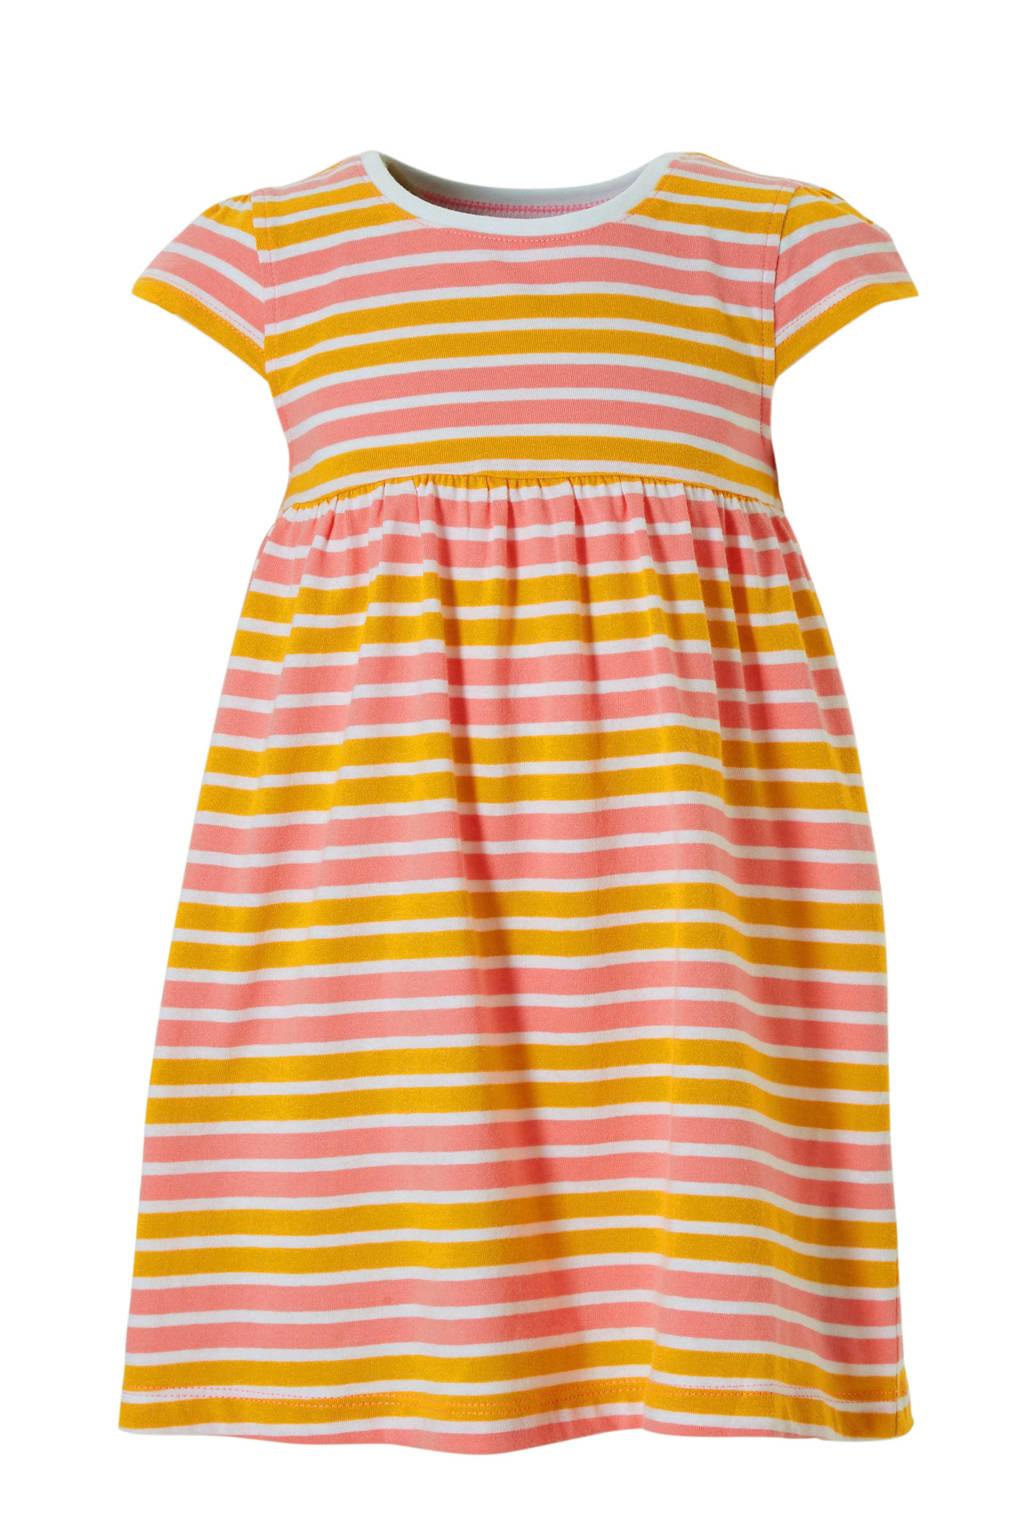 NAME IT gestreepte jurk Vamaja, Roze/ wit/ oranje